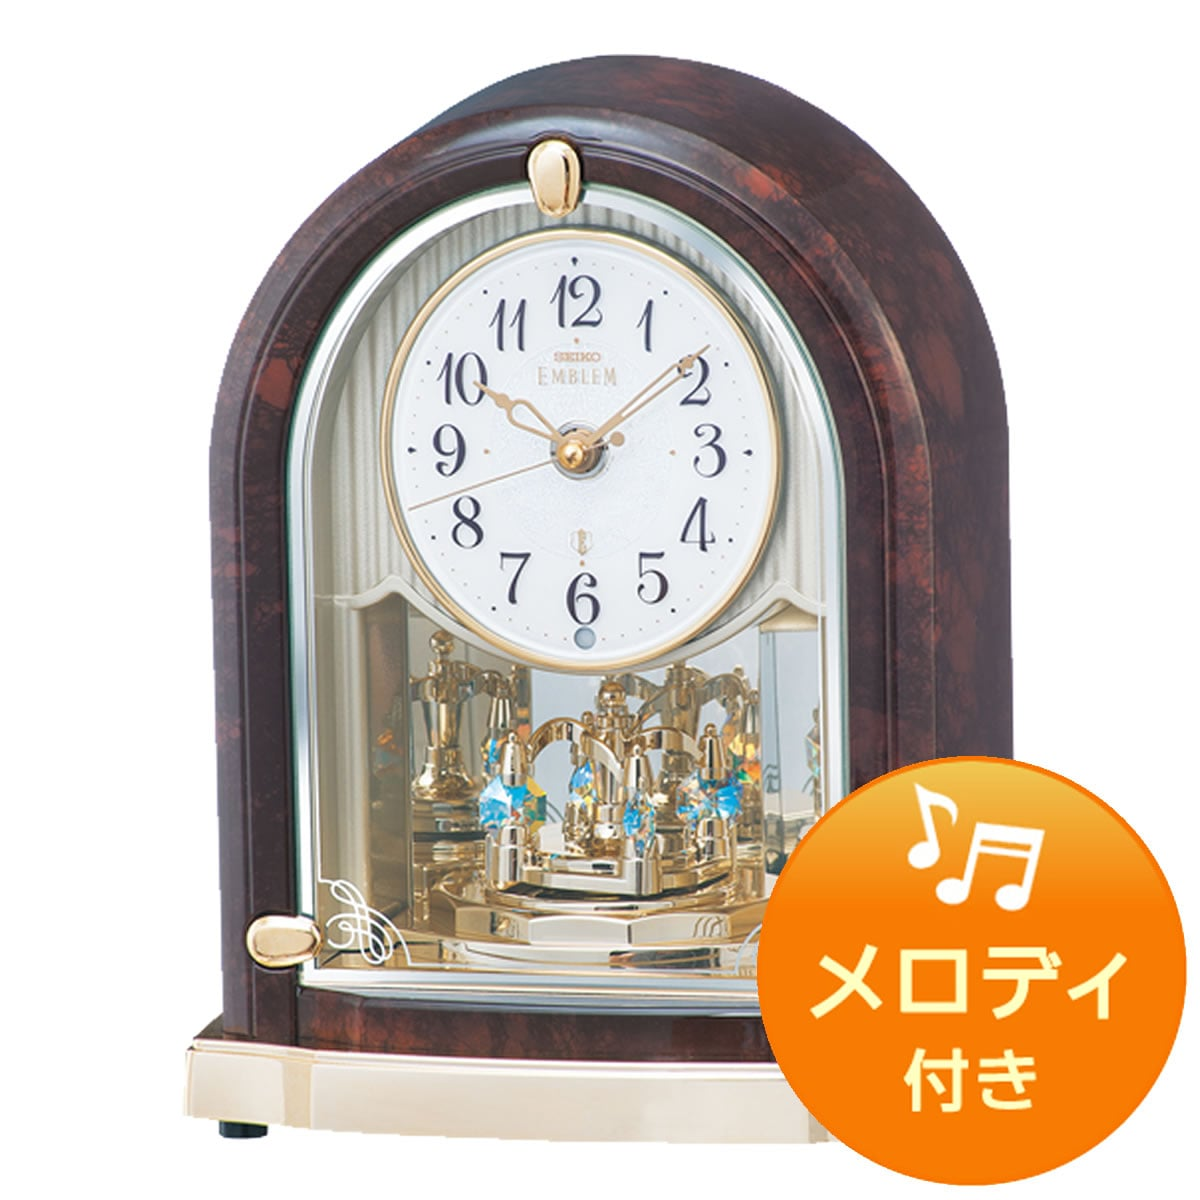 SEIKO EMBLEM(セイコー エムブレム)回転飾り付 電波アミューズ置き時計 HW590M 濃茶